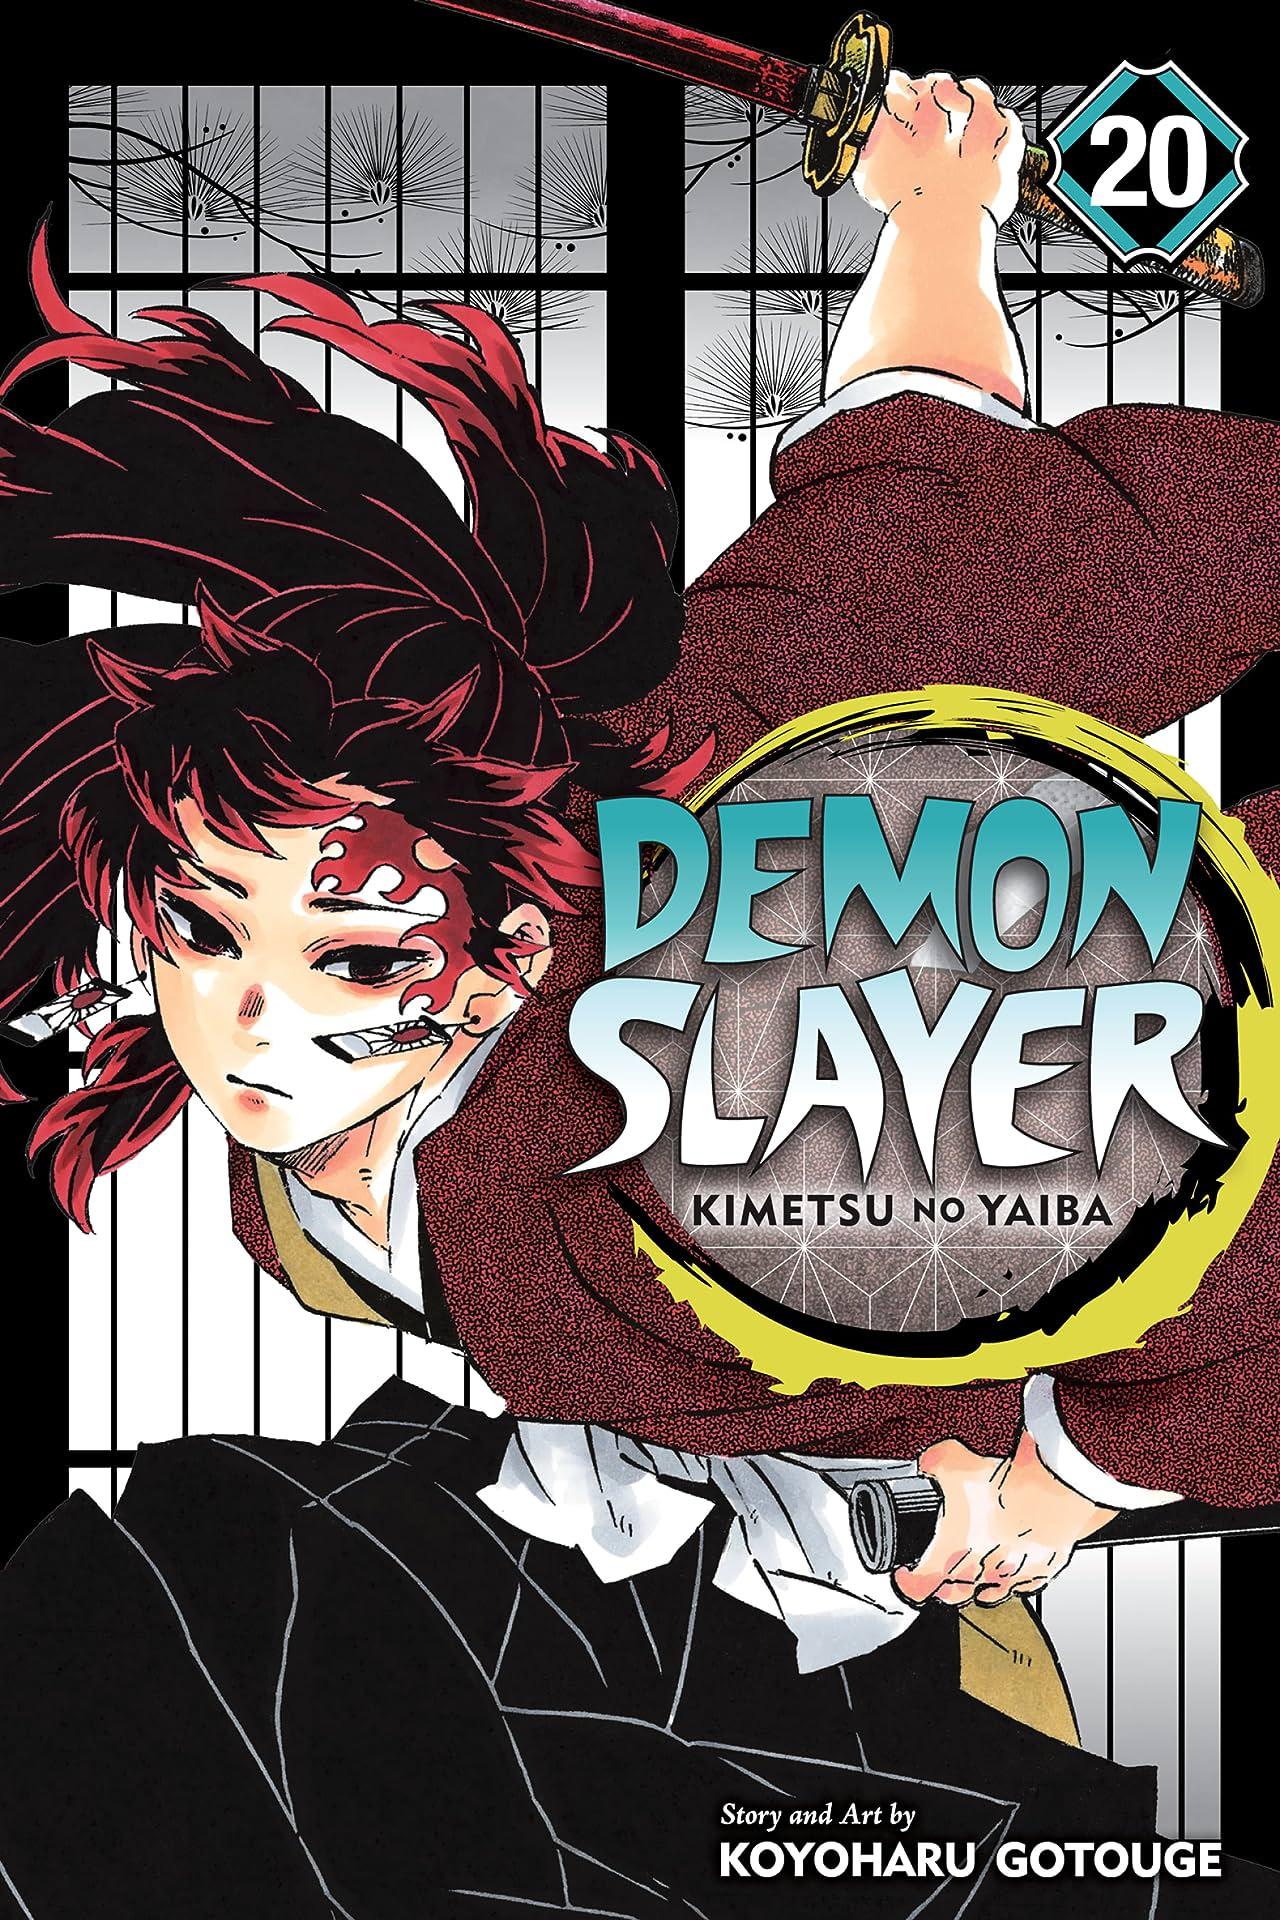 Demon Slayer: Kimetsu no Yaiba Vol. 20: The Path Of Opening A Steadfast Heart